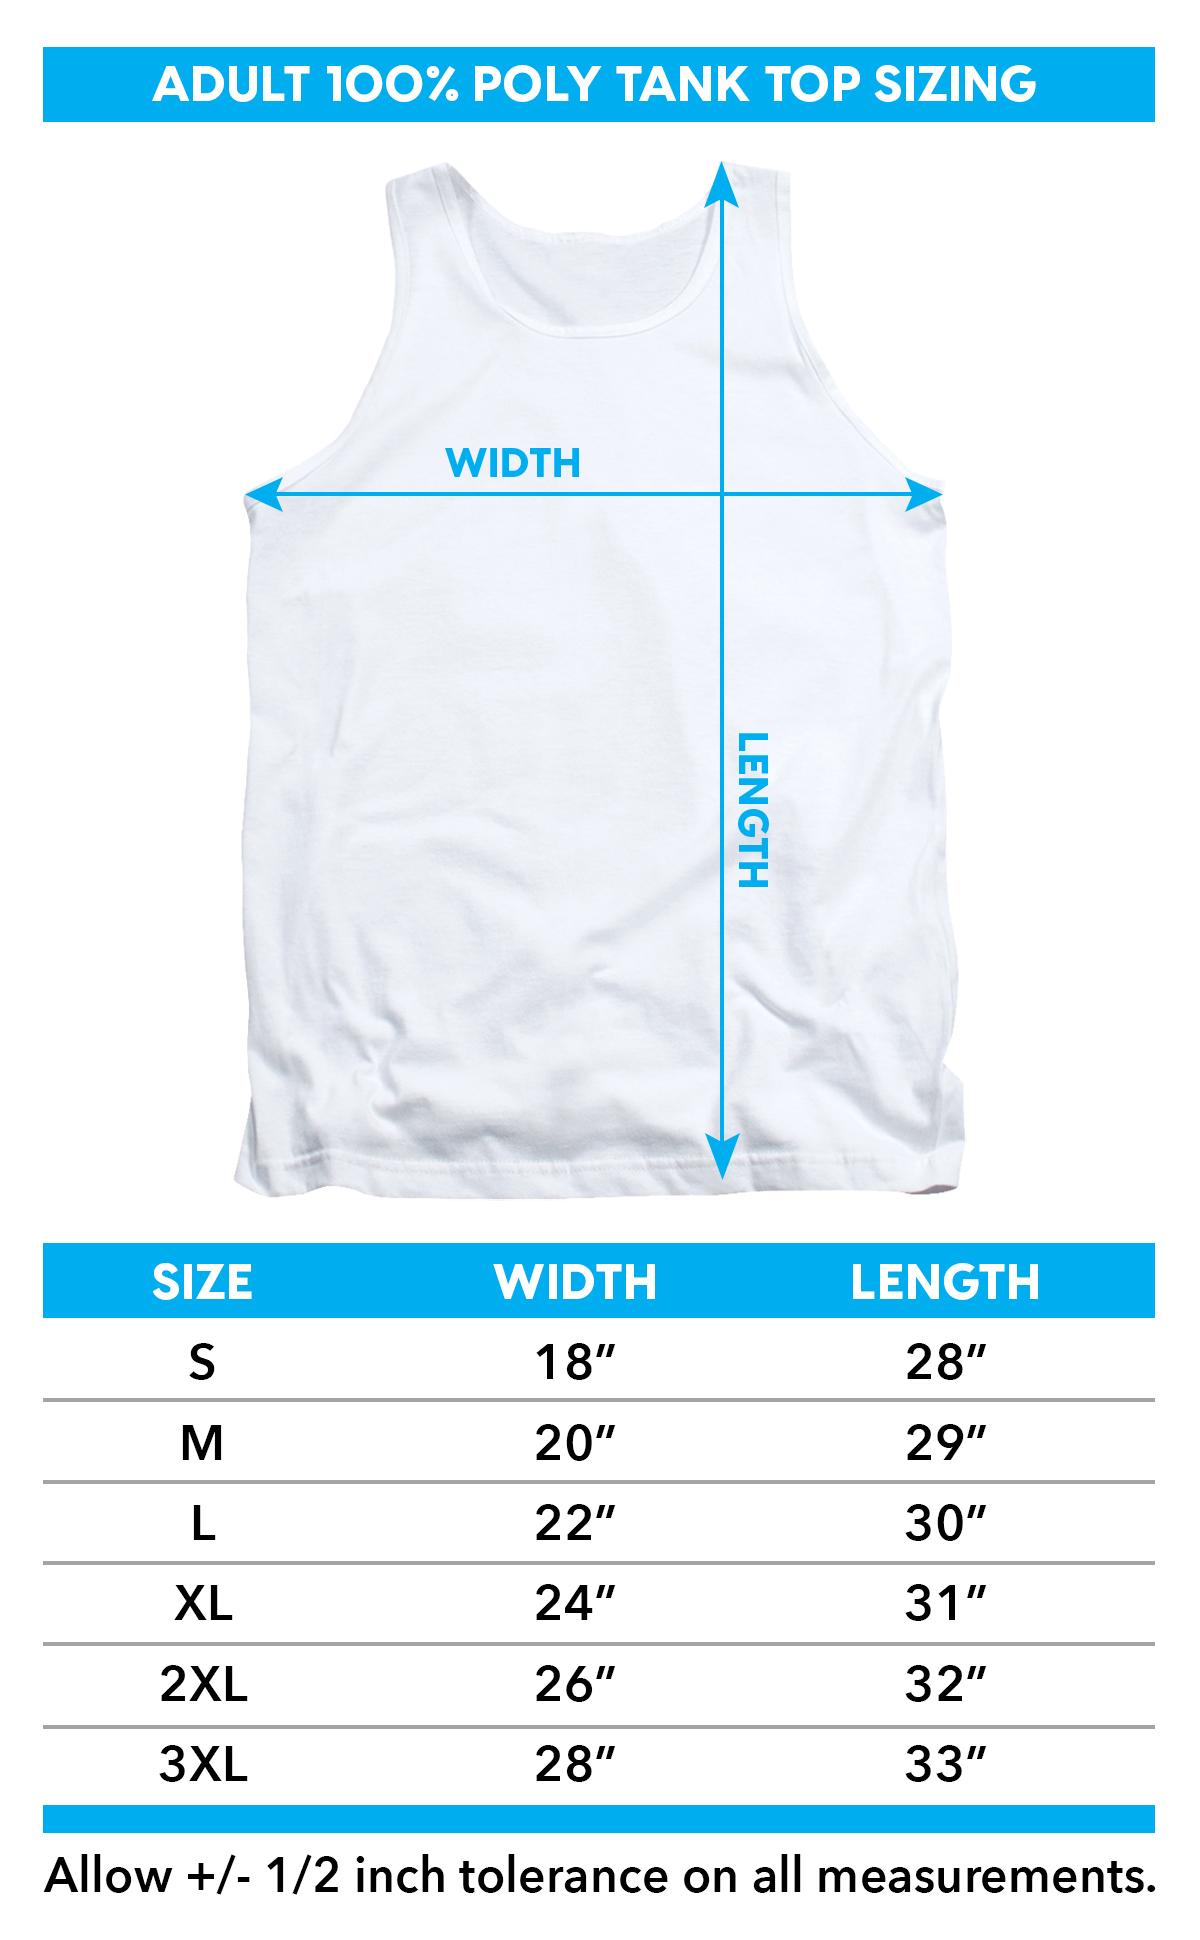 tkpp-size-chart-1.jpg